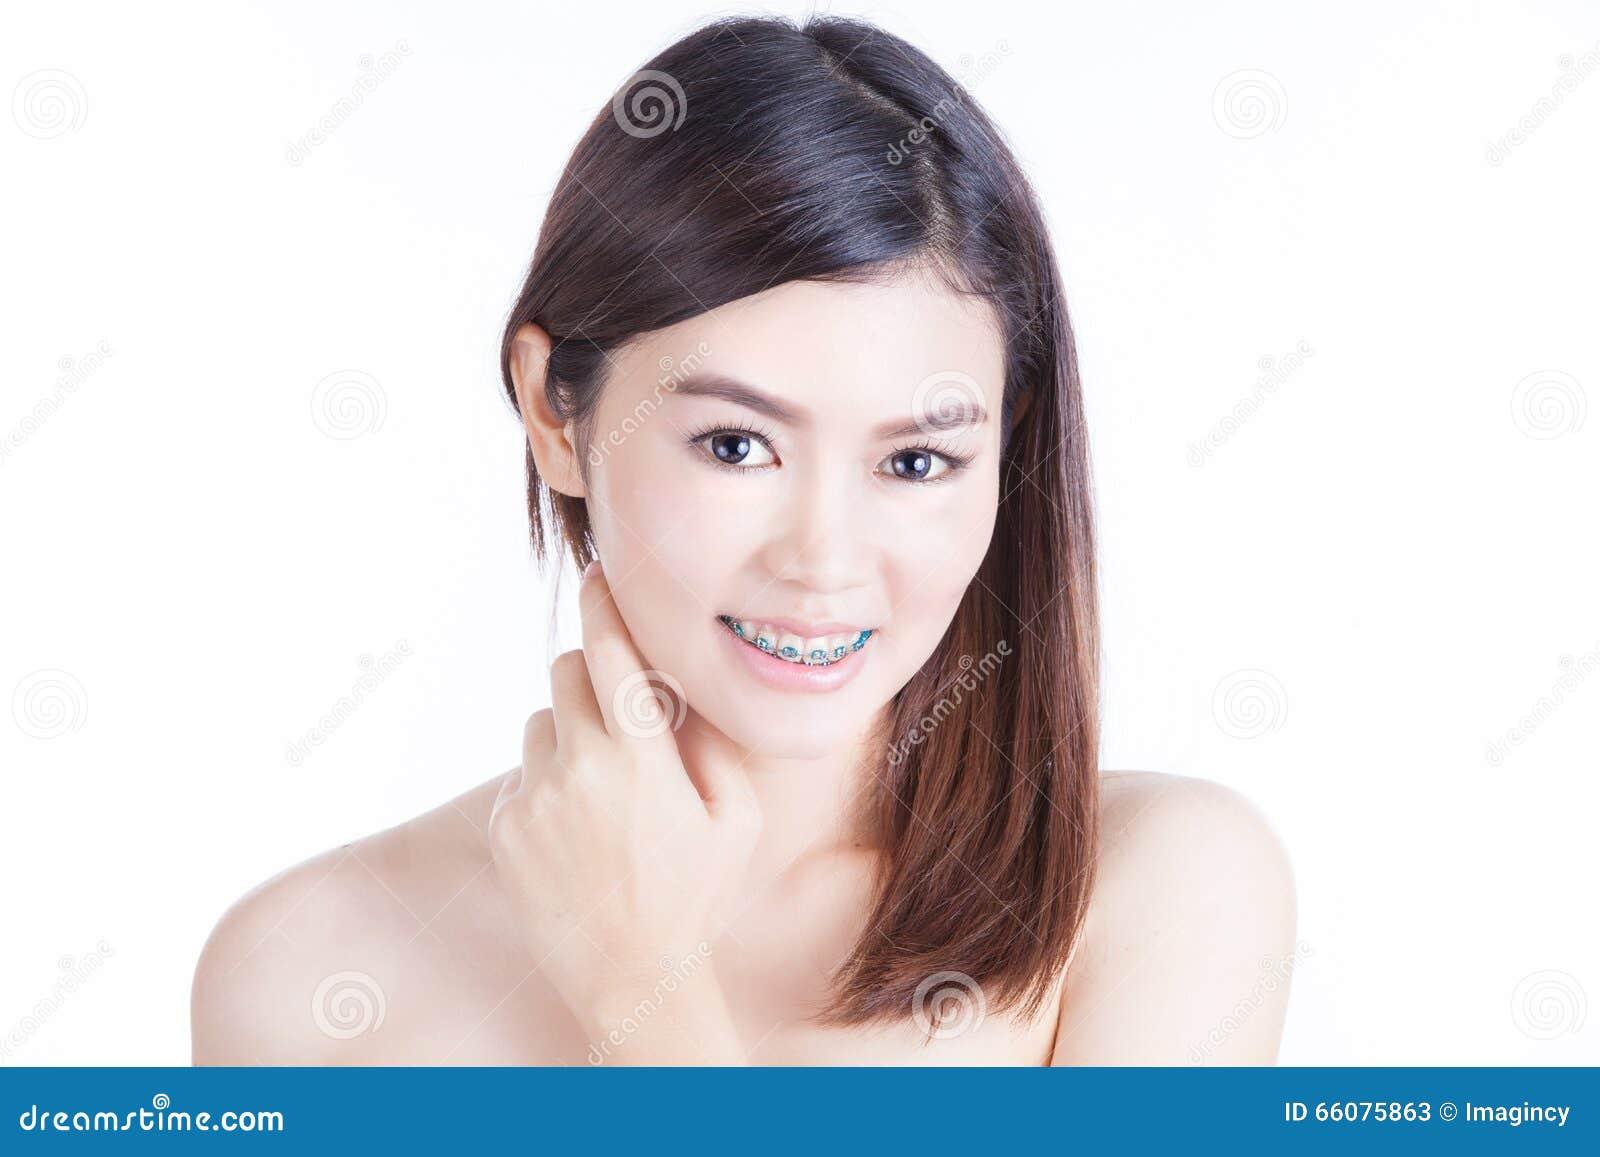 Asiadatecom Beautiful Asian Women searching for Love and